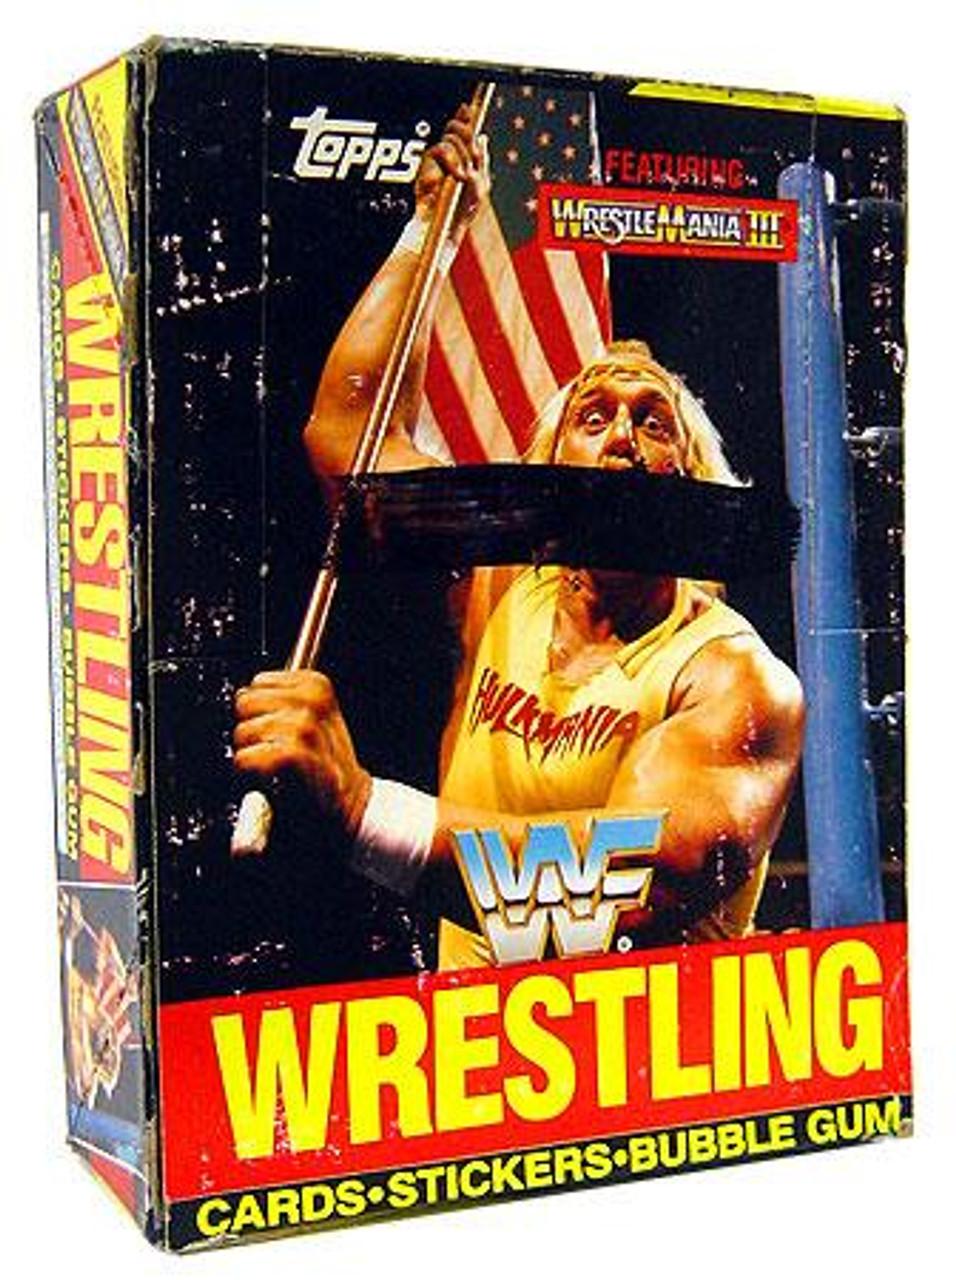 WWE Wrestling WWF 1987 Wrestlemania III Wax Box Trading Card Box